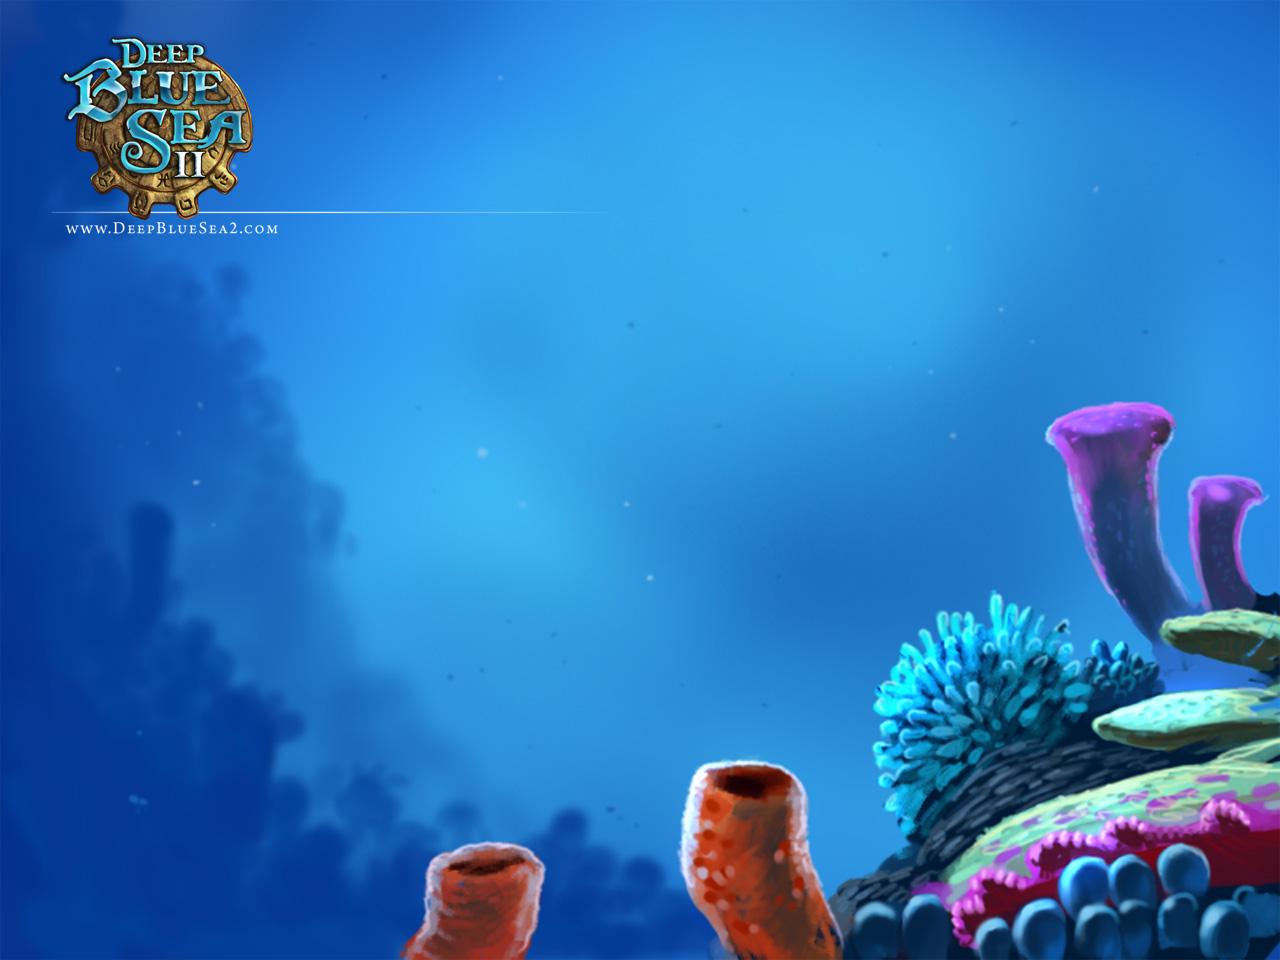 Deep Love Desktop Wallpaper : Deep Sea Desktop Wallpaper - WallpaperSafari